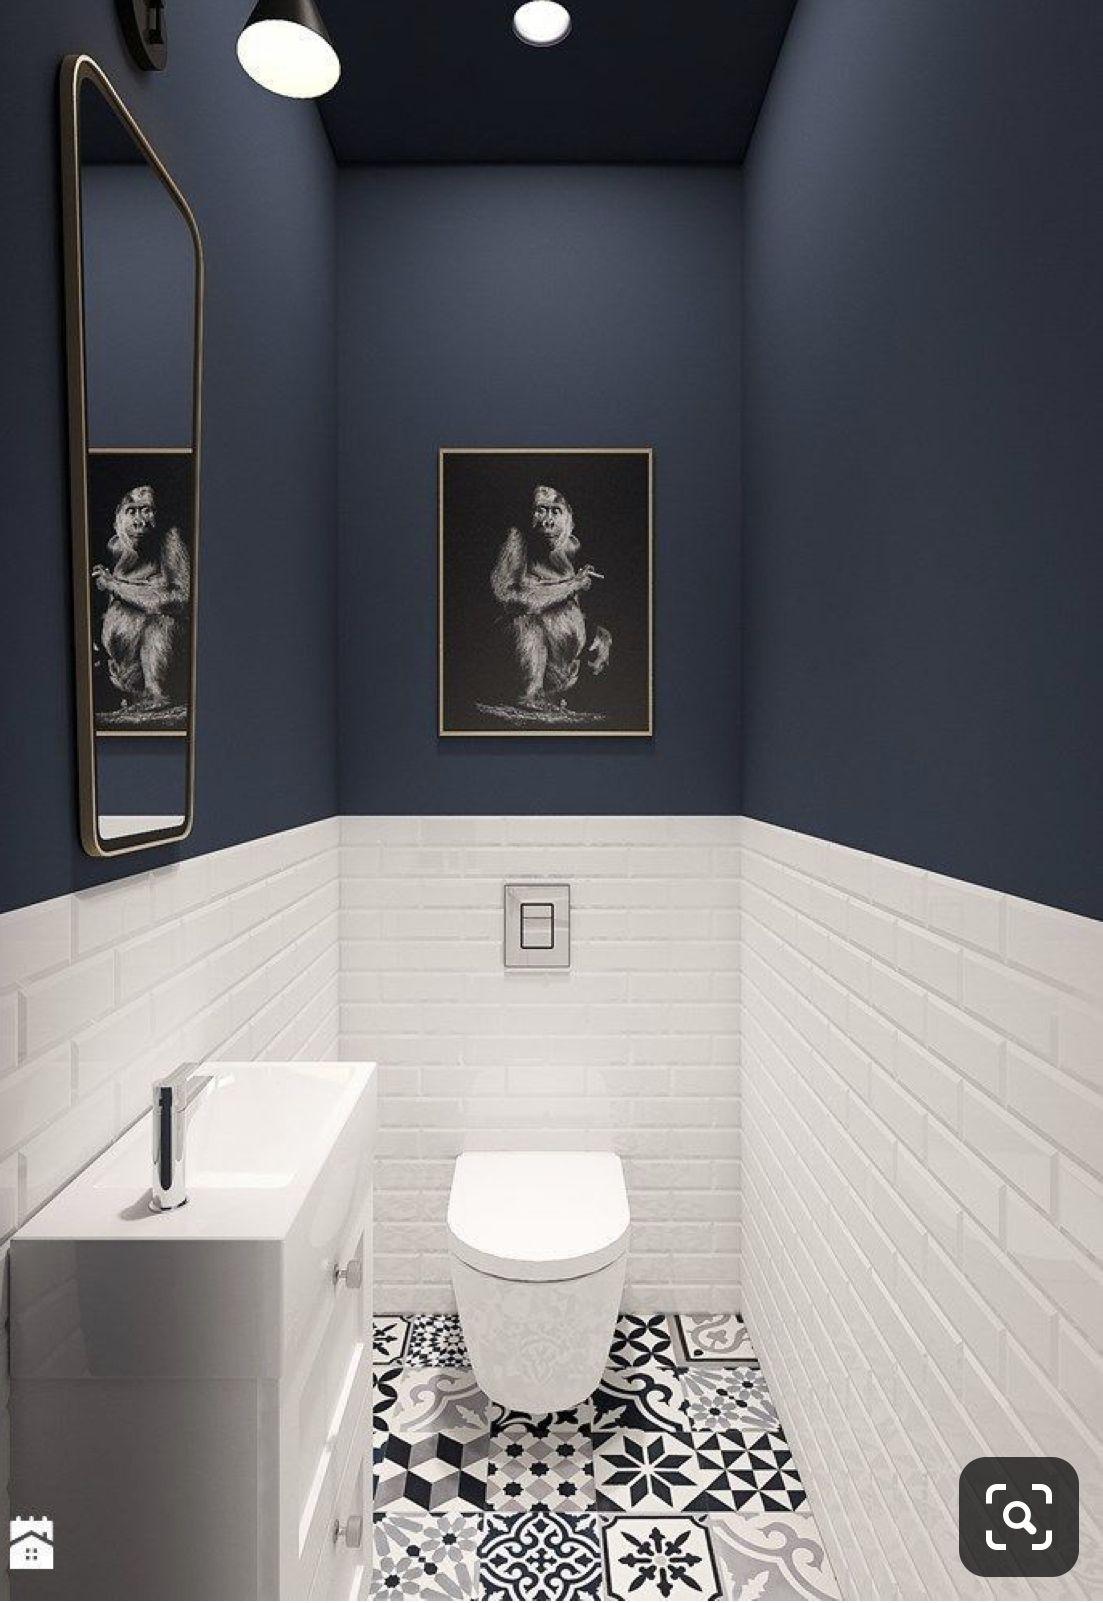 Pin By Amanda Mcdaniel On Bathroom Small Bathroom Decor Bathroom Interior Design Small Toilet Room